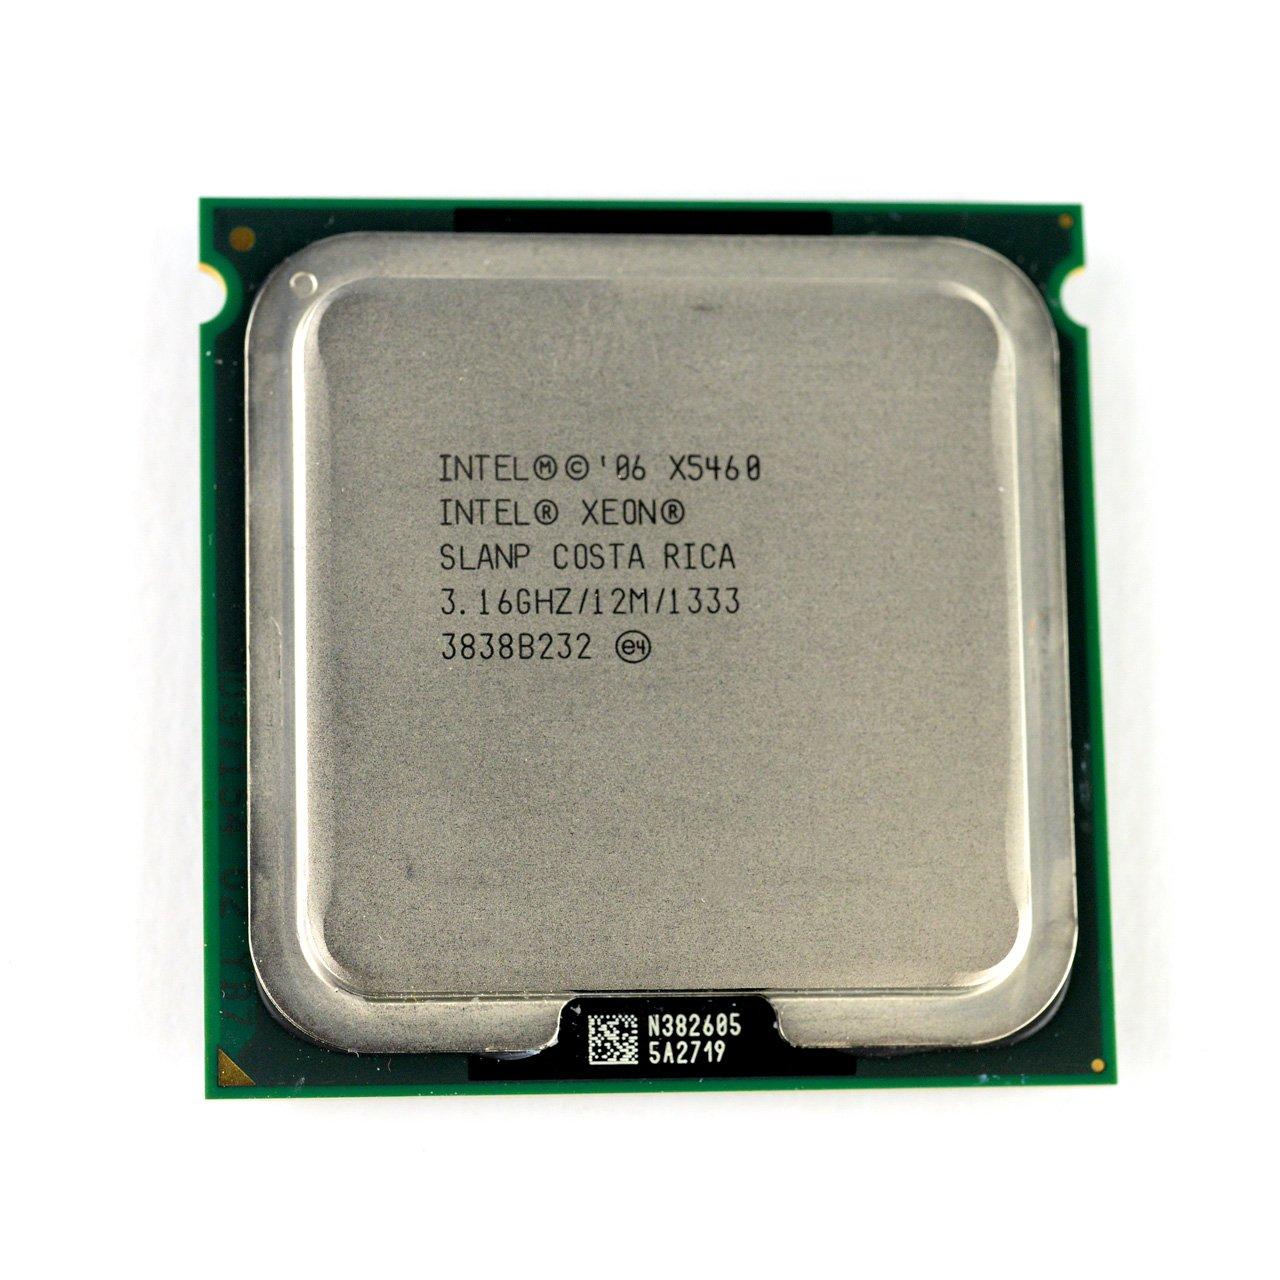 Intel - Xeon 3 16GHz/12M/1333 LGA771 (X5460) Quad Core CPU - SLANP